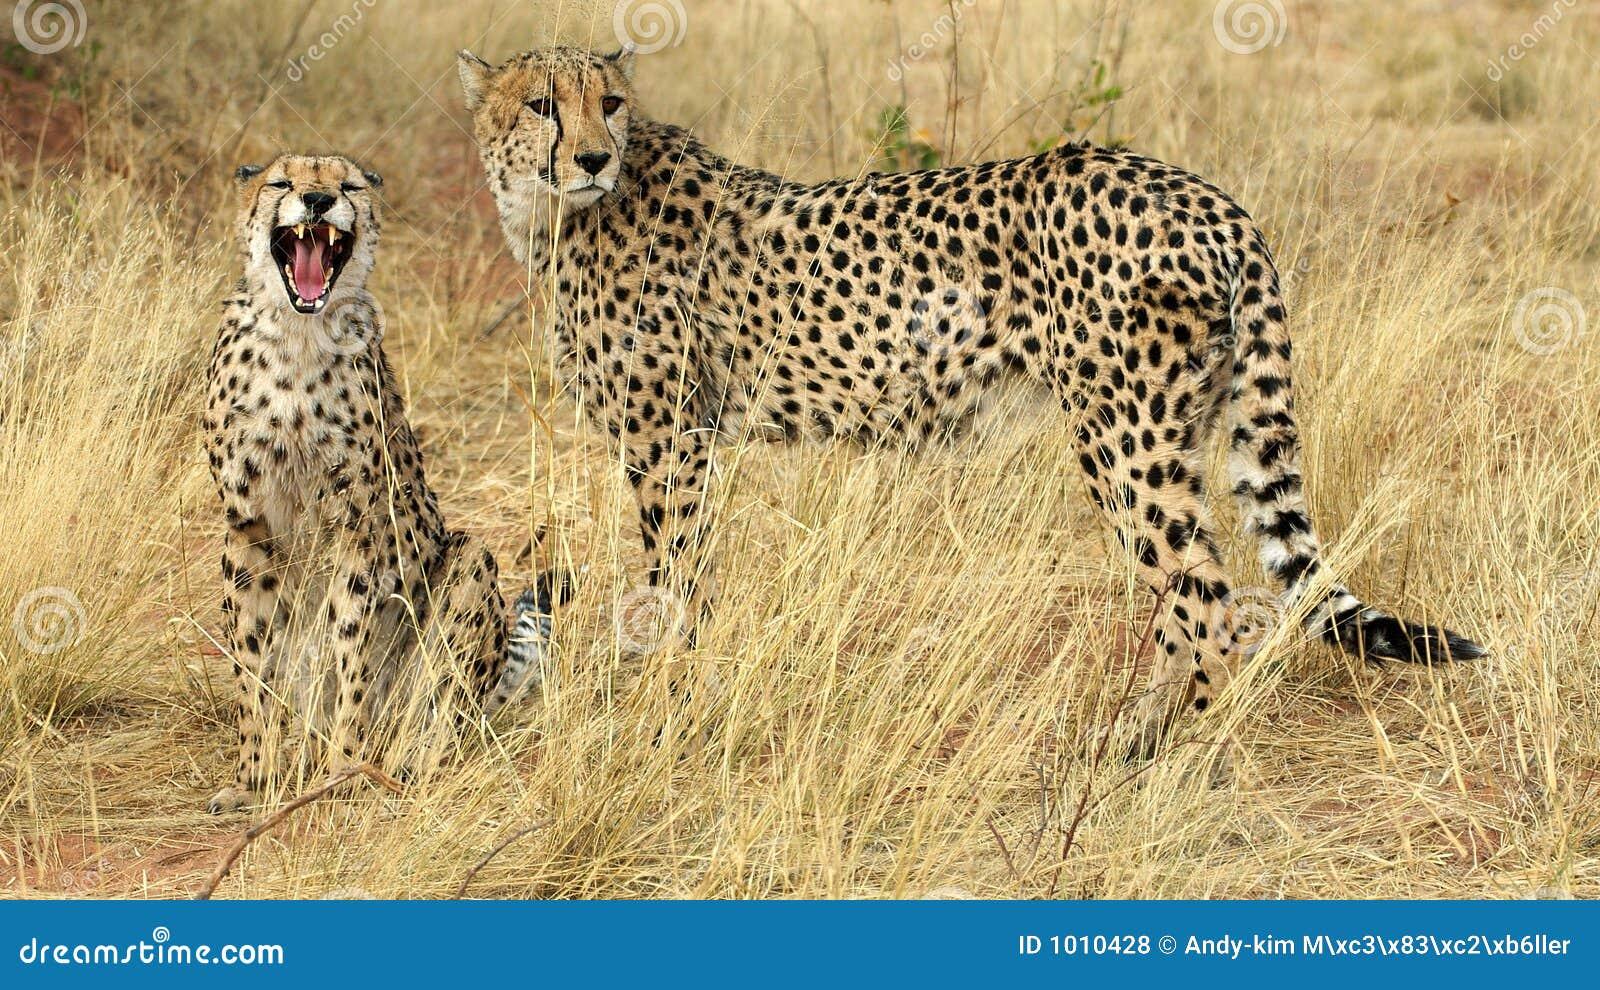 Teeth of a cheetah